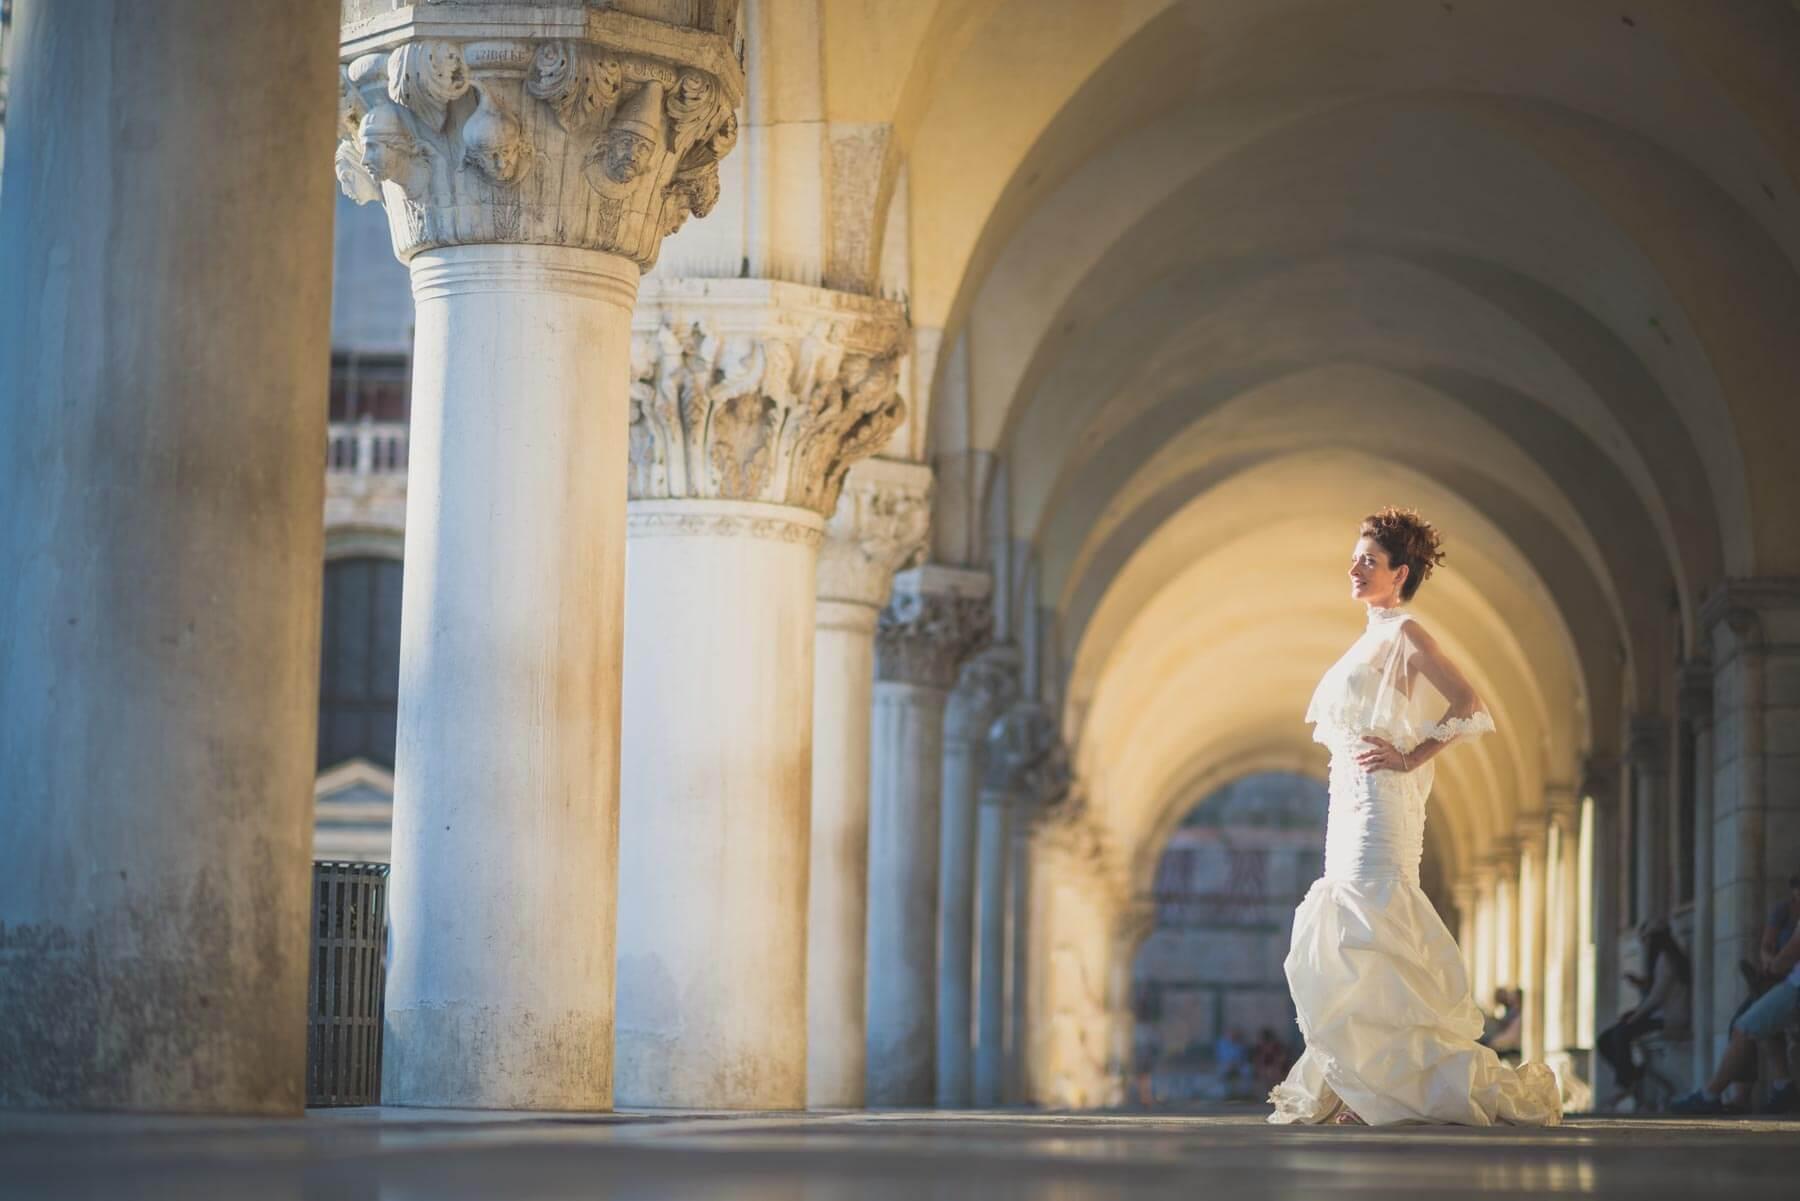 Serena e Vladimir - Matrimonio a Venezia Venice Wedding 09